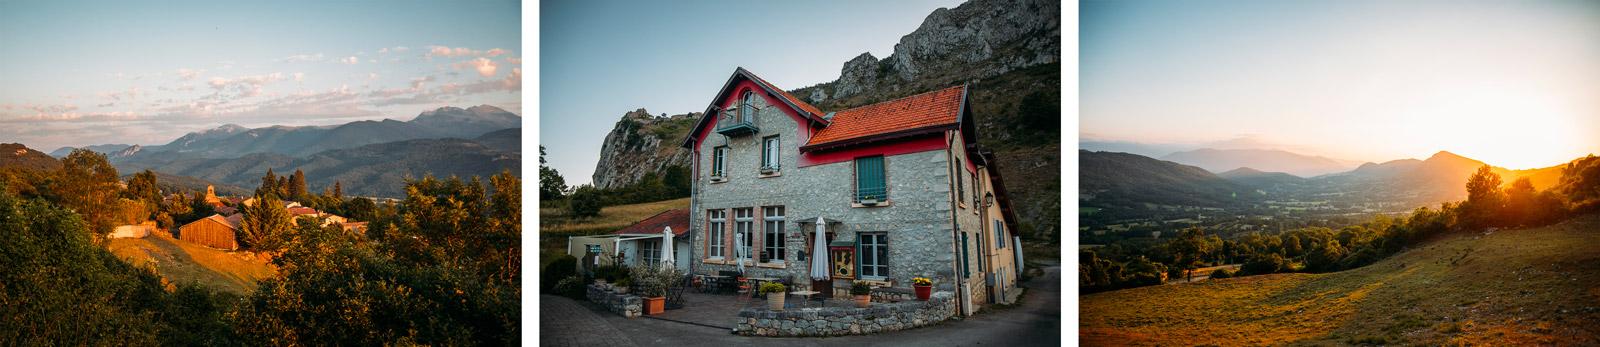 étape 1 du GR 107 de Foix à Roquefixade